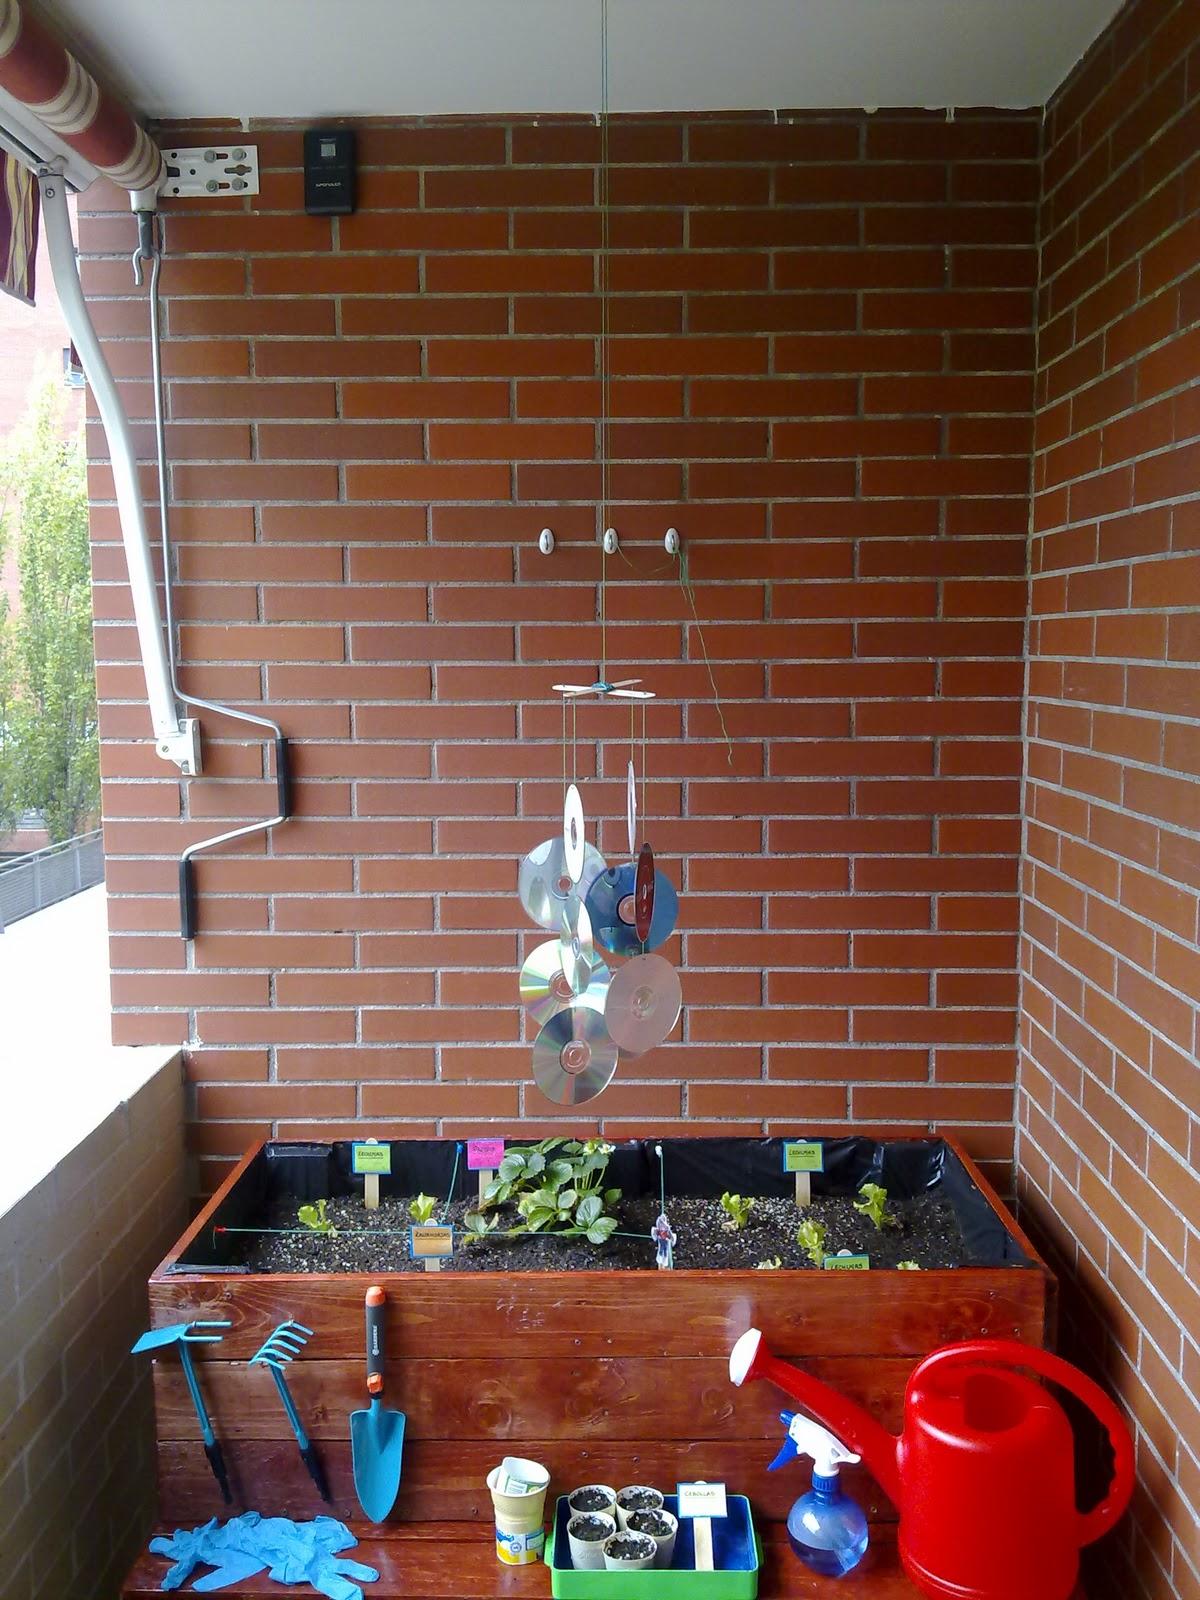 Cortoypegoyvuelvoaempezar mesa de cultivo - Mesa de cultivo ...